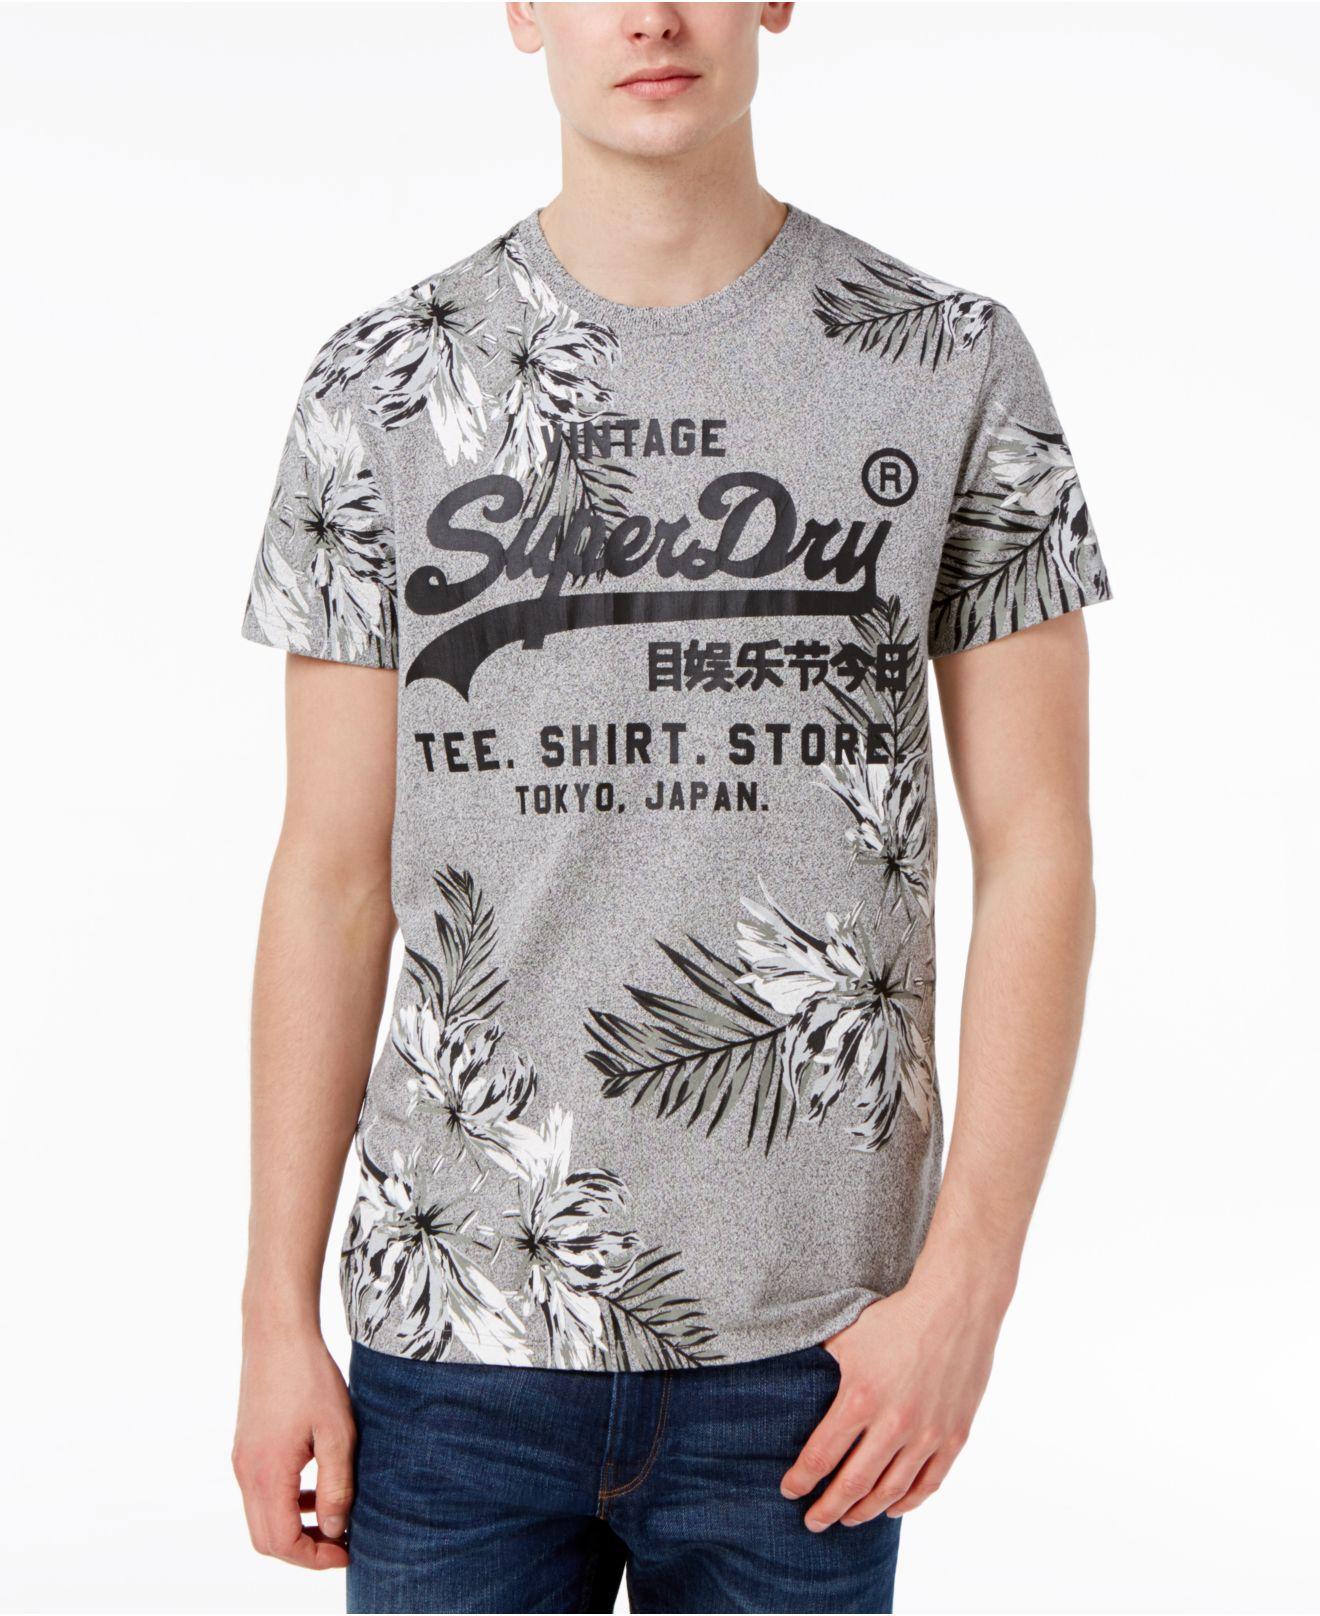 0017595ff Lyst - Superdry Men's Surf Store Floral Graphic-print Logo Cotton T ...